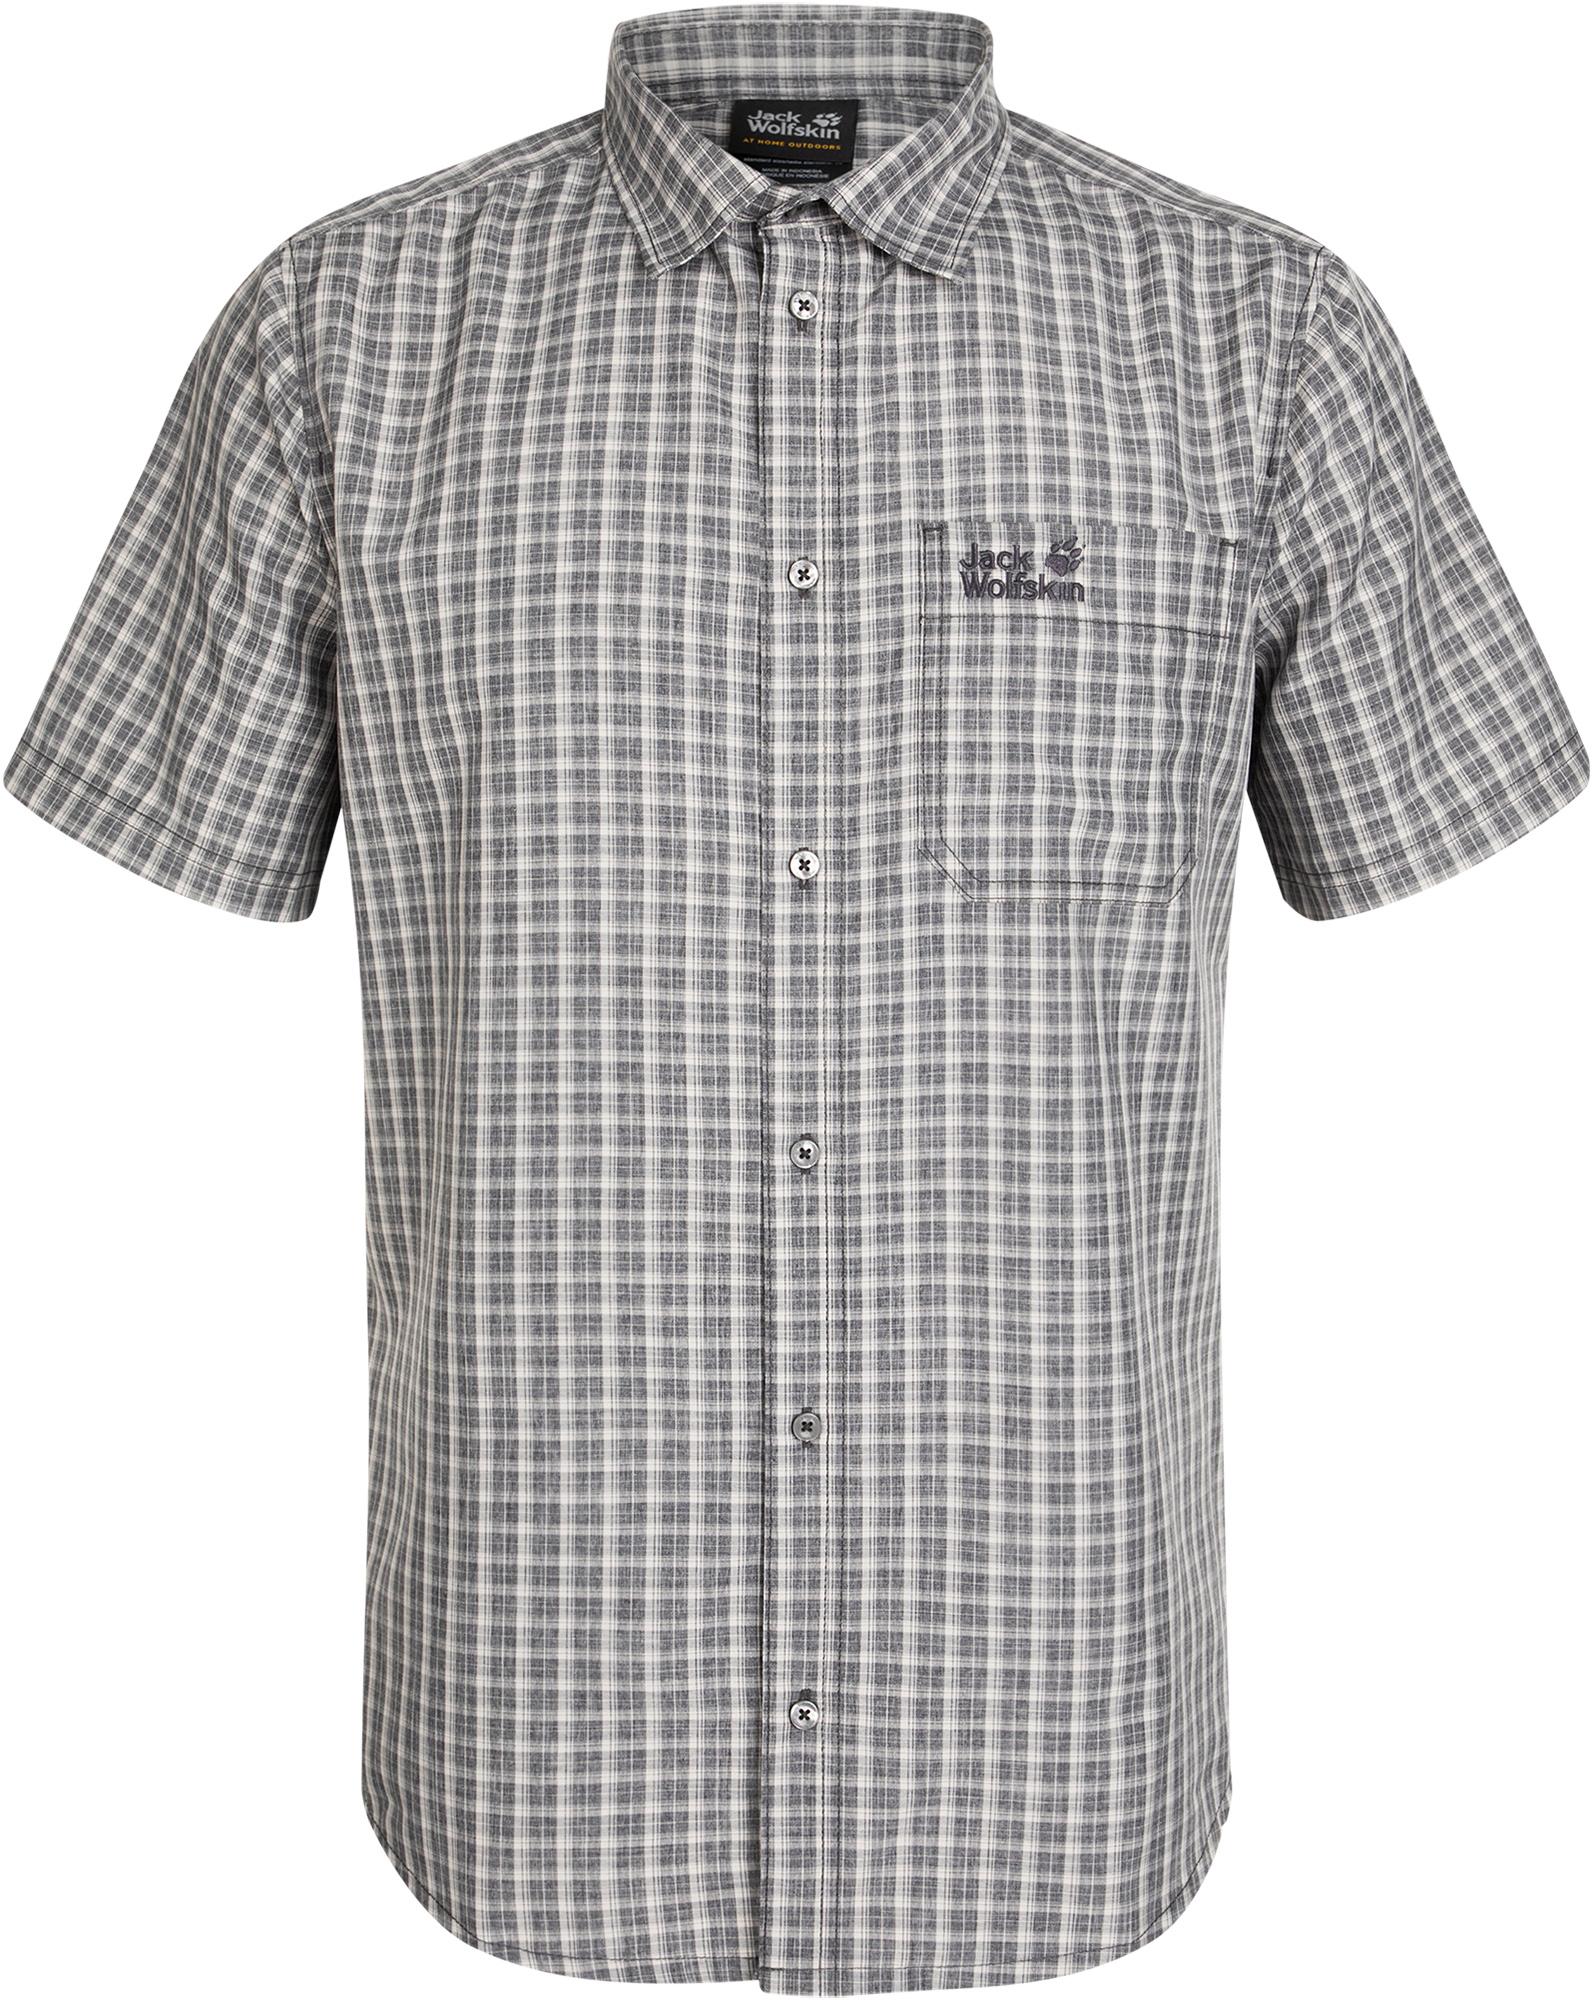 JACK WOLFSKIN Рубашка с коротким рукавом мужская Jack Wolfskin El Dorado, размер 58